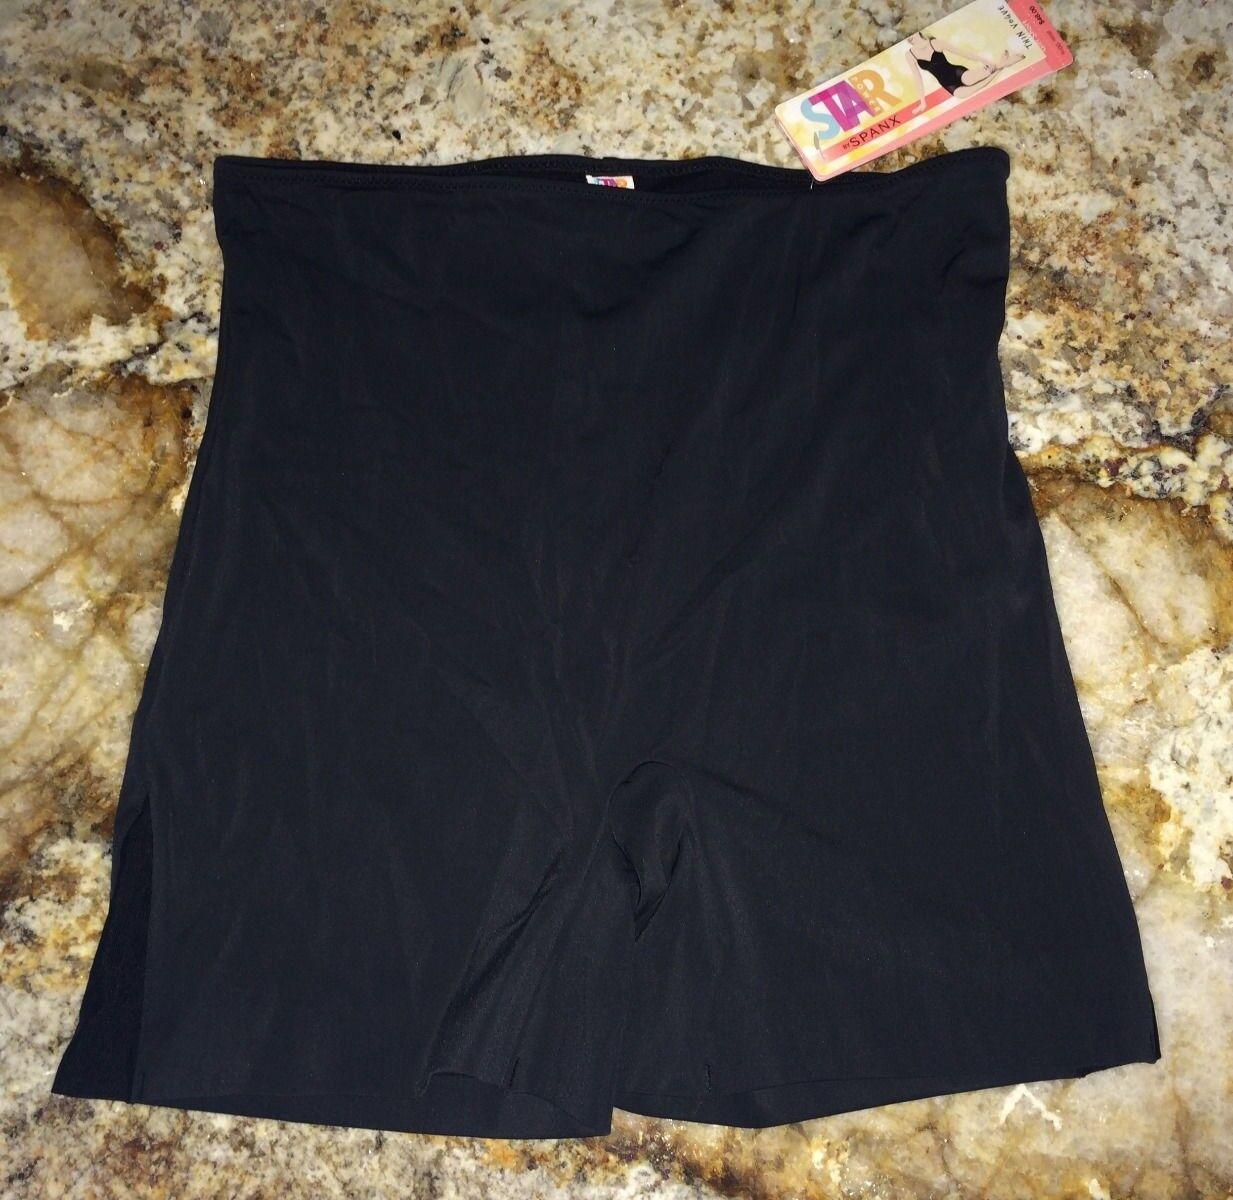 90dc9c69c12 STAR POWER SPANX Thin Vogue Medium Control Black Girl Shorts NEW Womens S L  XL